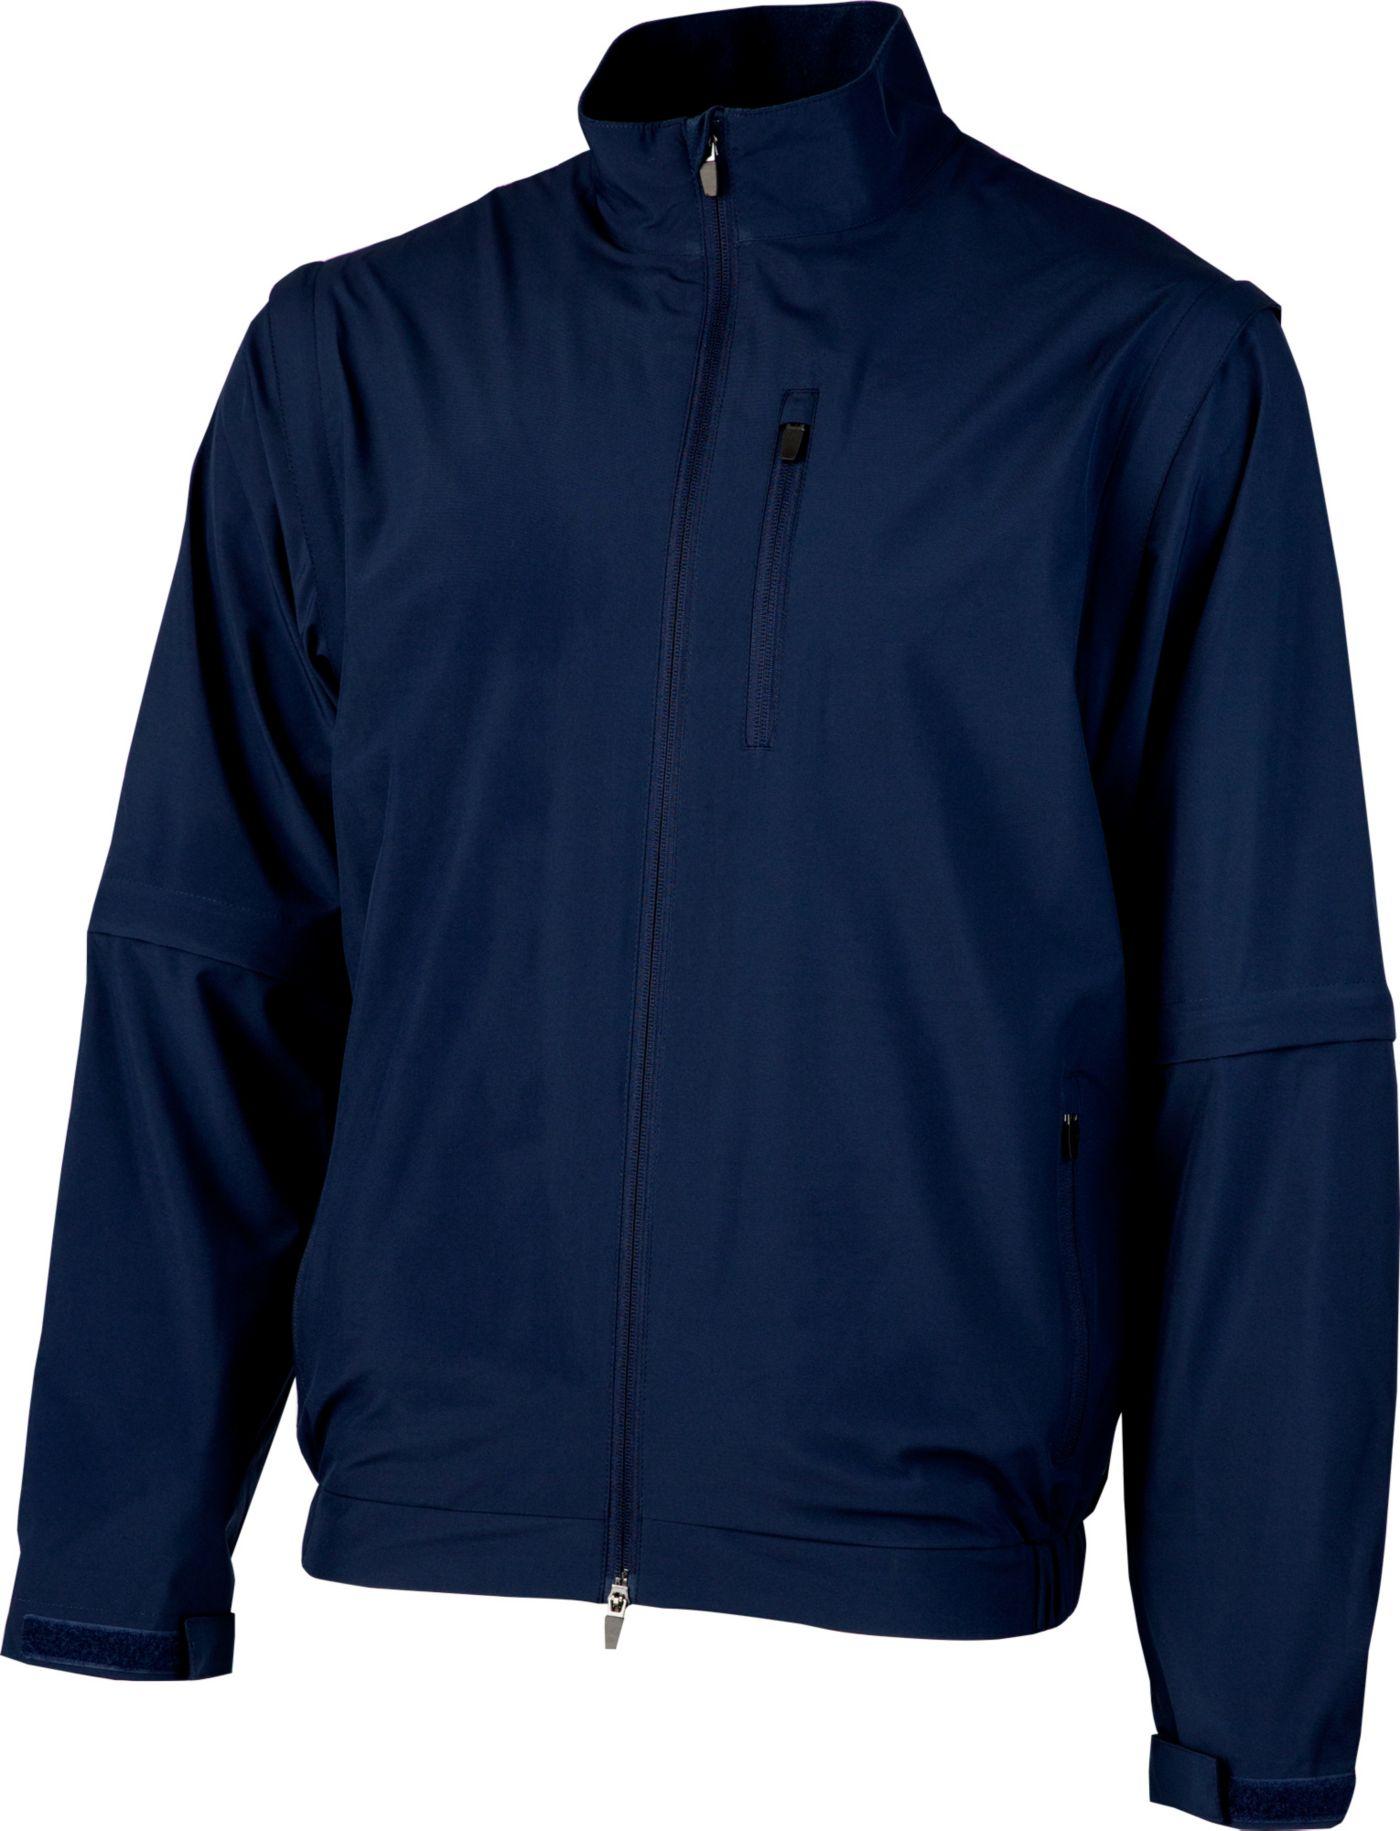 Walter Hagen 3-In-1 Jacket